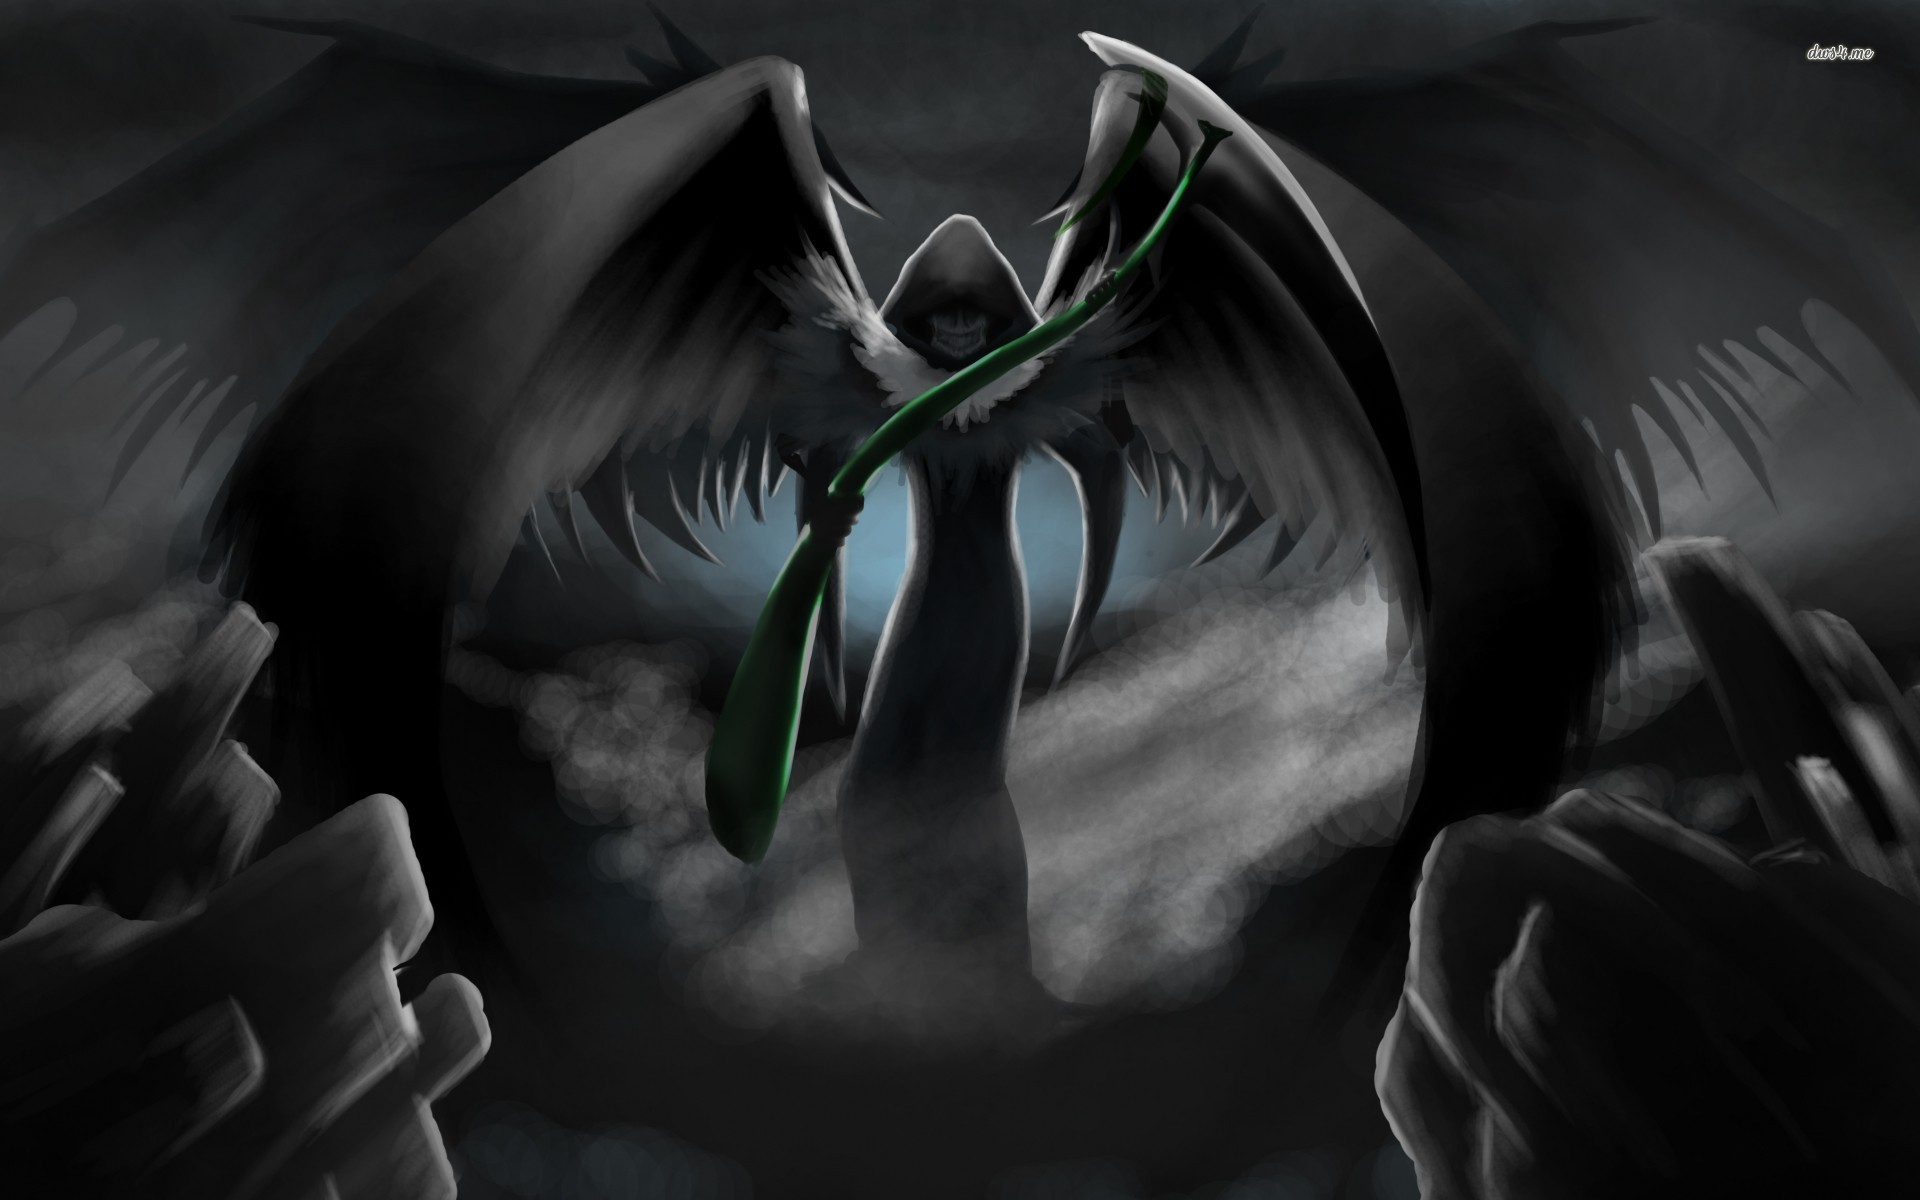 Grim Reaper wallpaper   968419 1920x1200